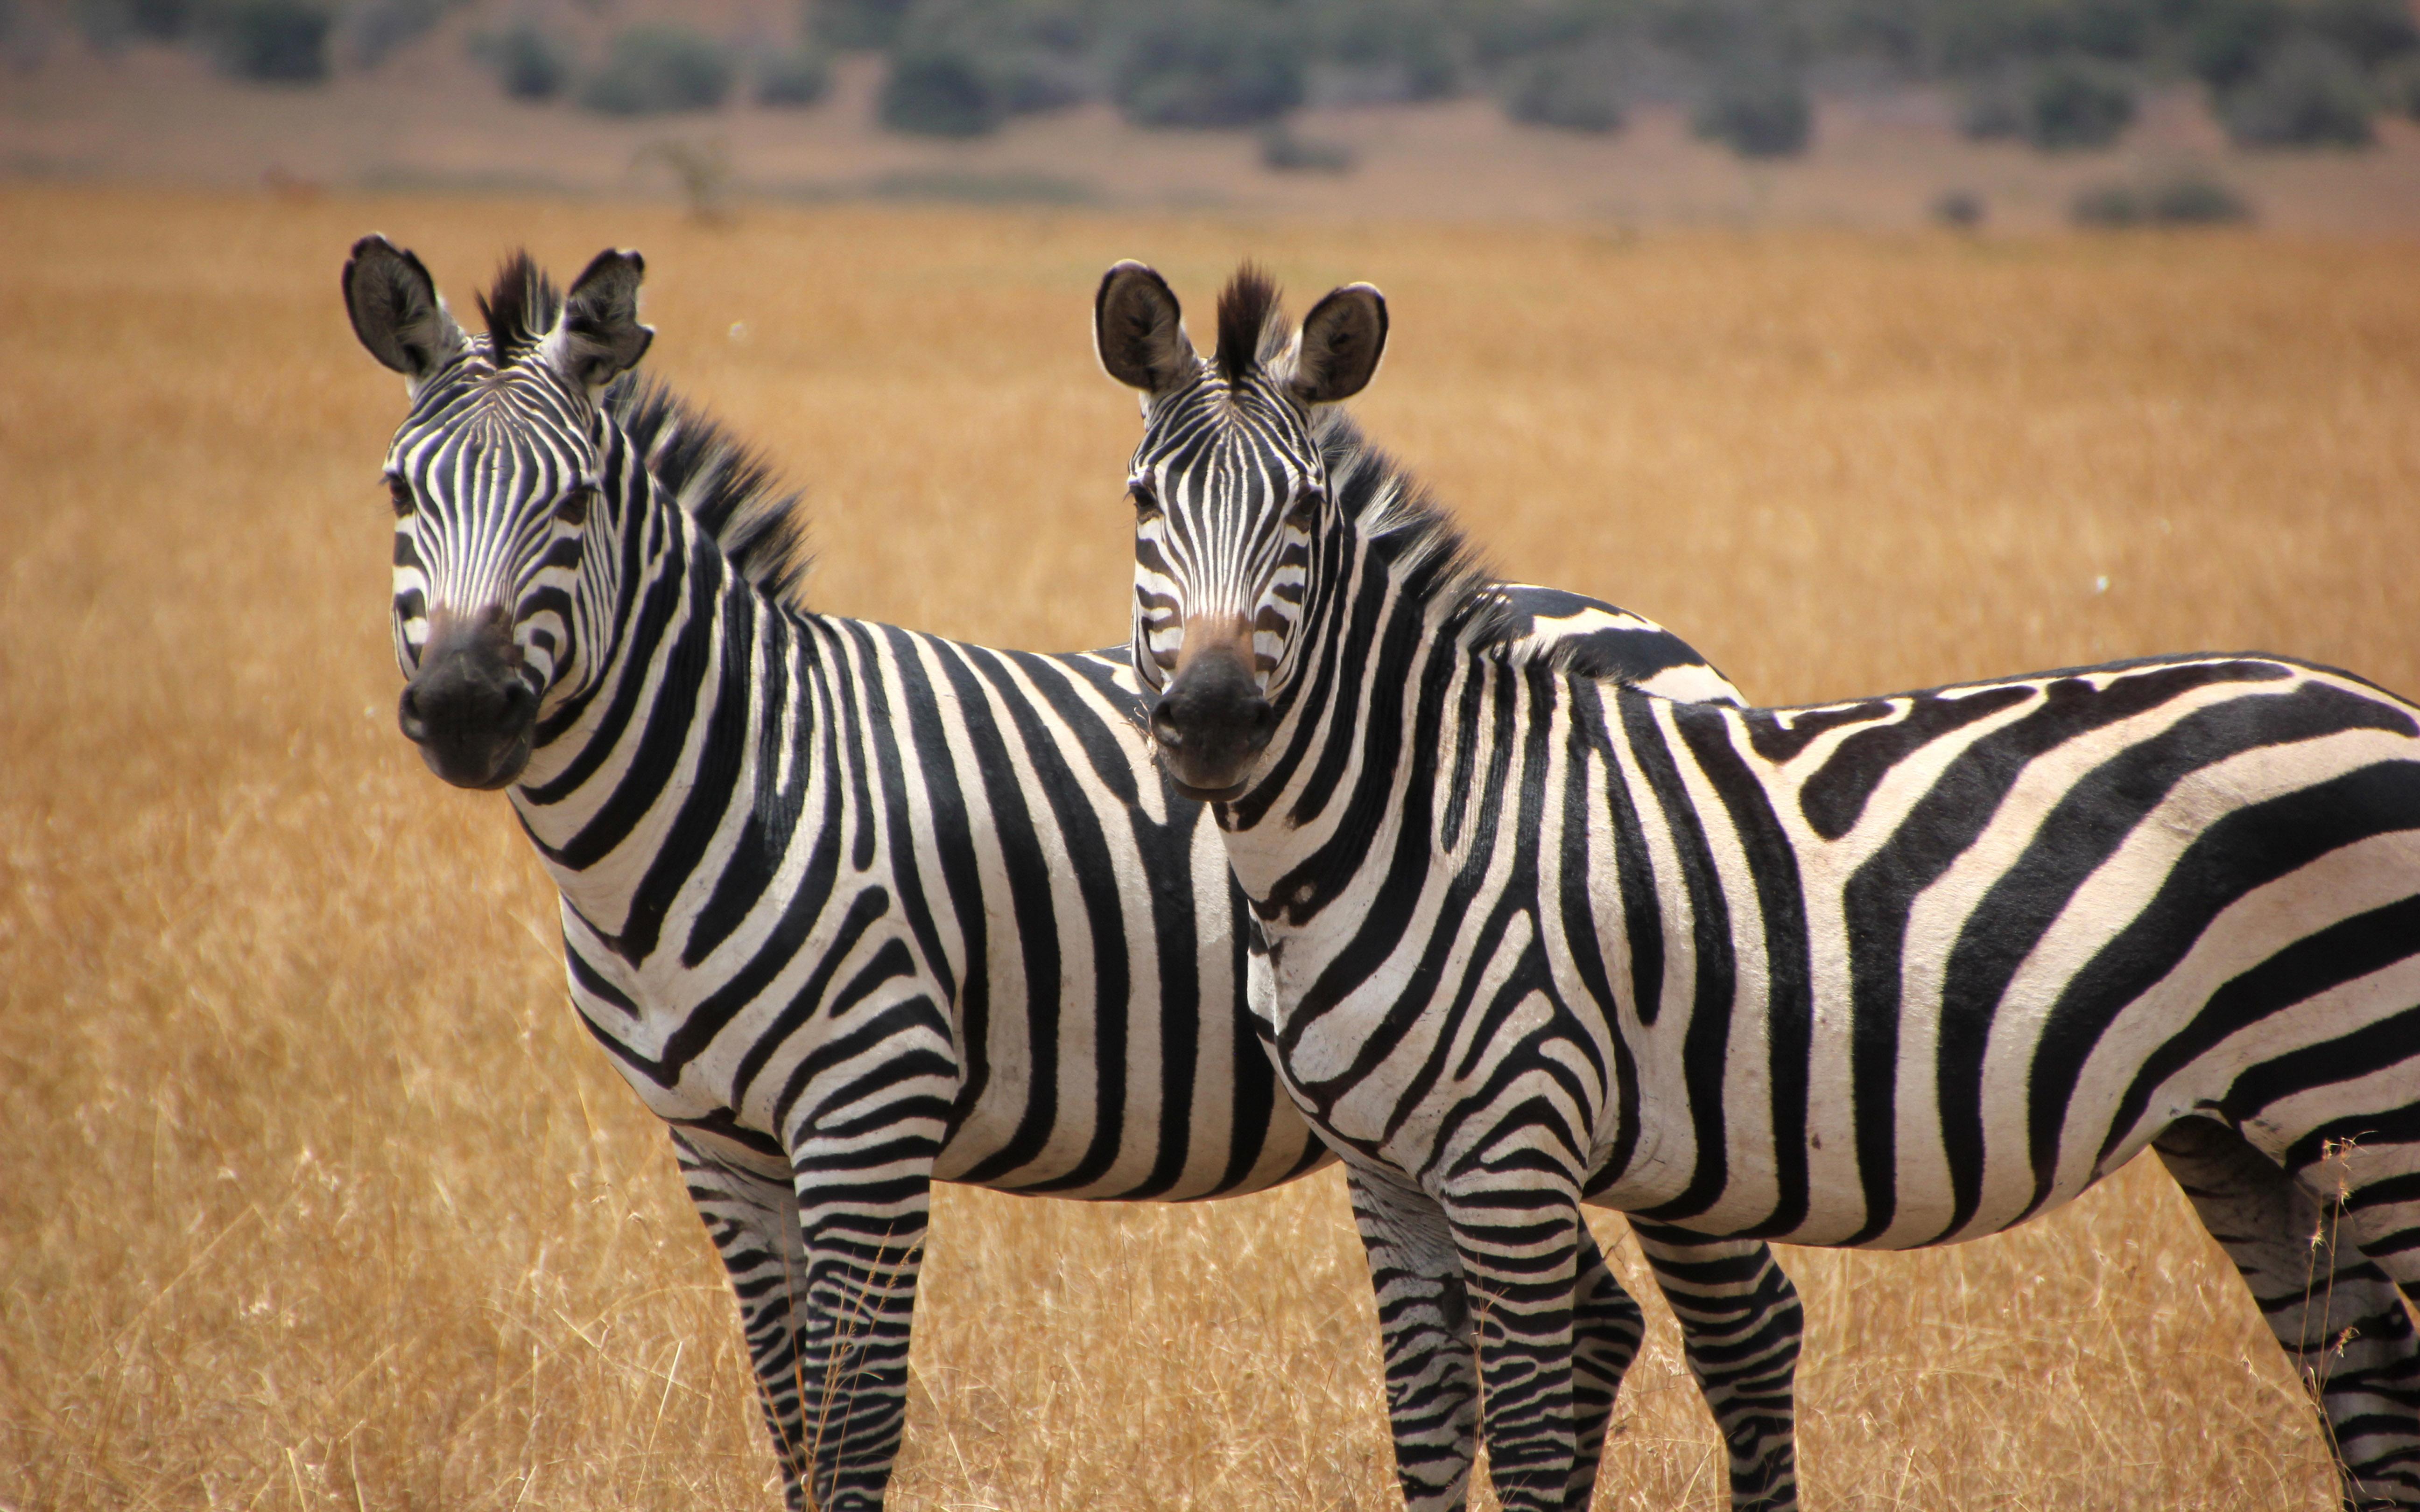 Sad Cute Baby Wallpaper Download Two Cute Zebras Animal Wallpaper Hd Wallpapers13 Com